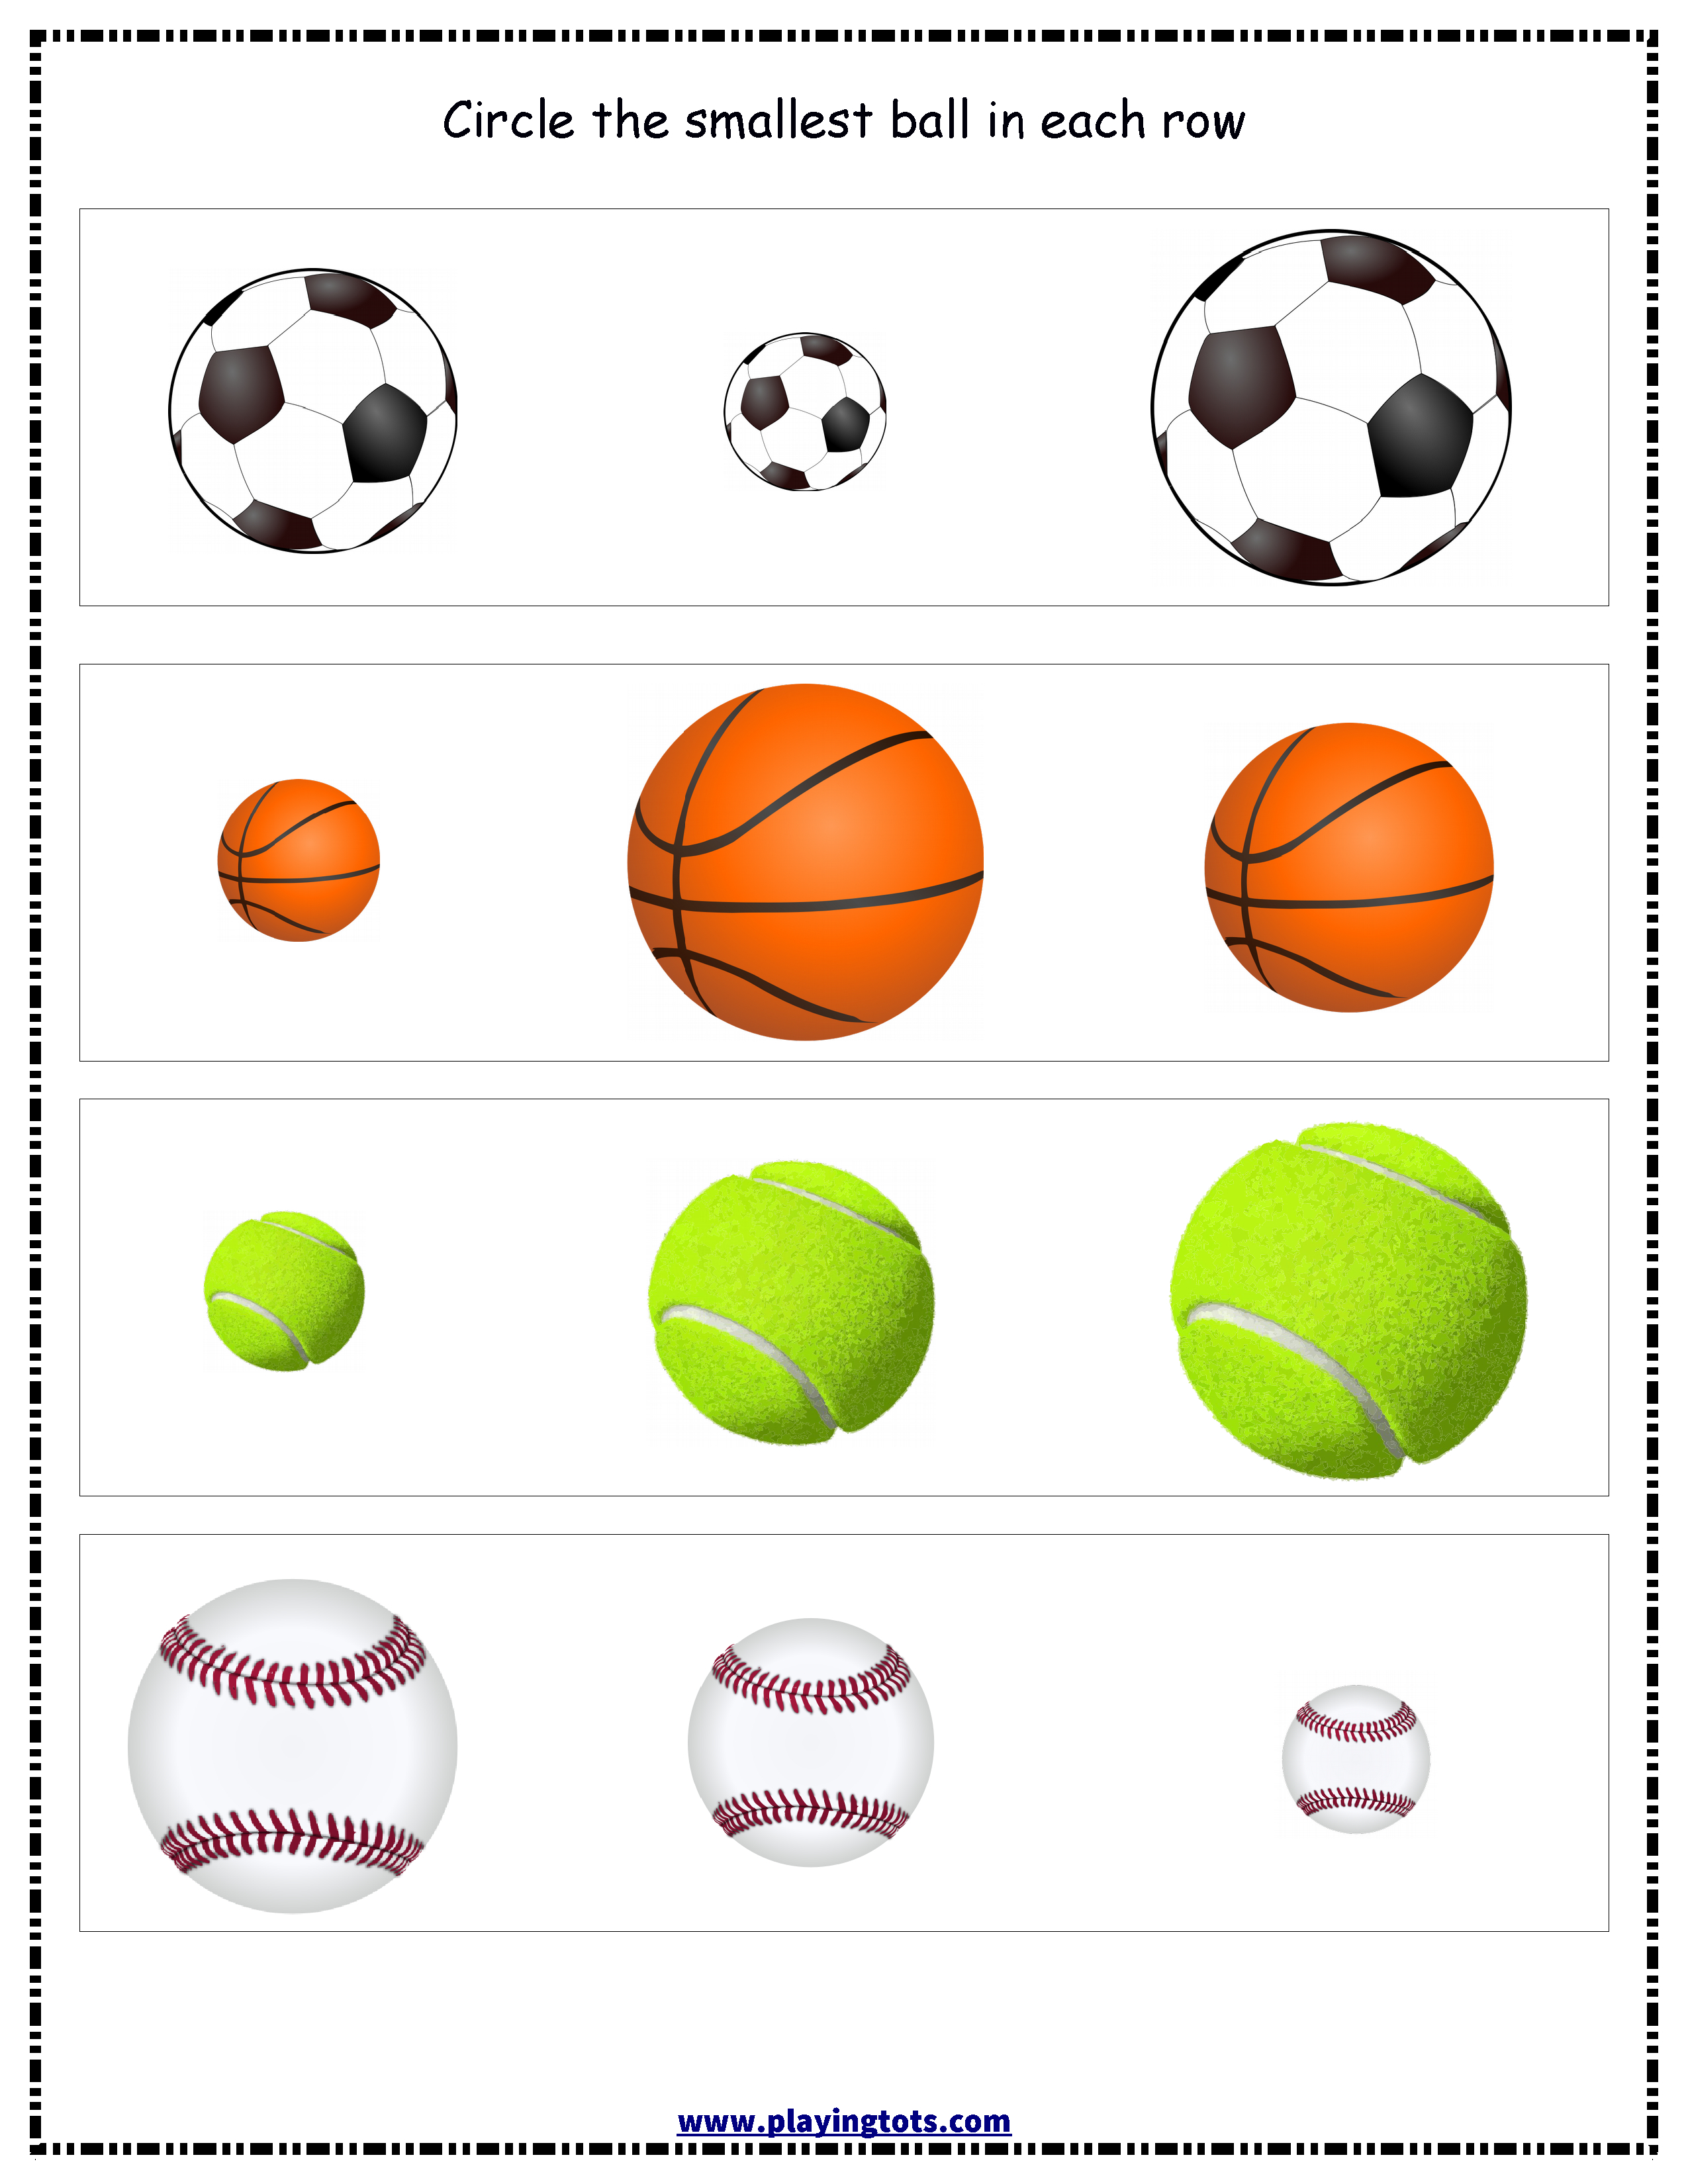 Balls Worksheet Keywords:free,printable,file,folder,toddler - Free Printable File Folders For Preschoolers